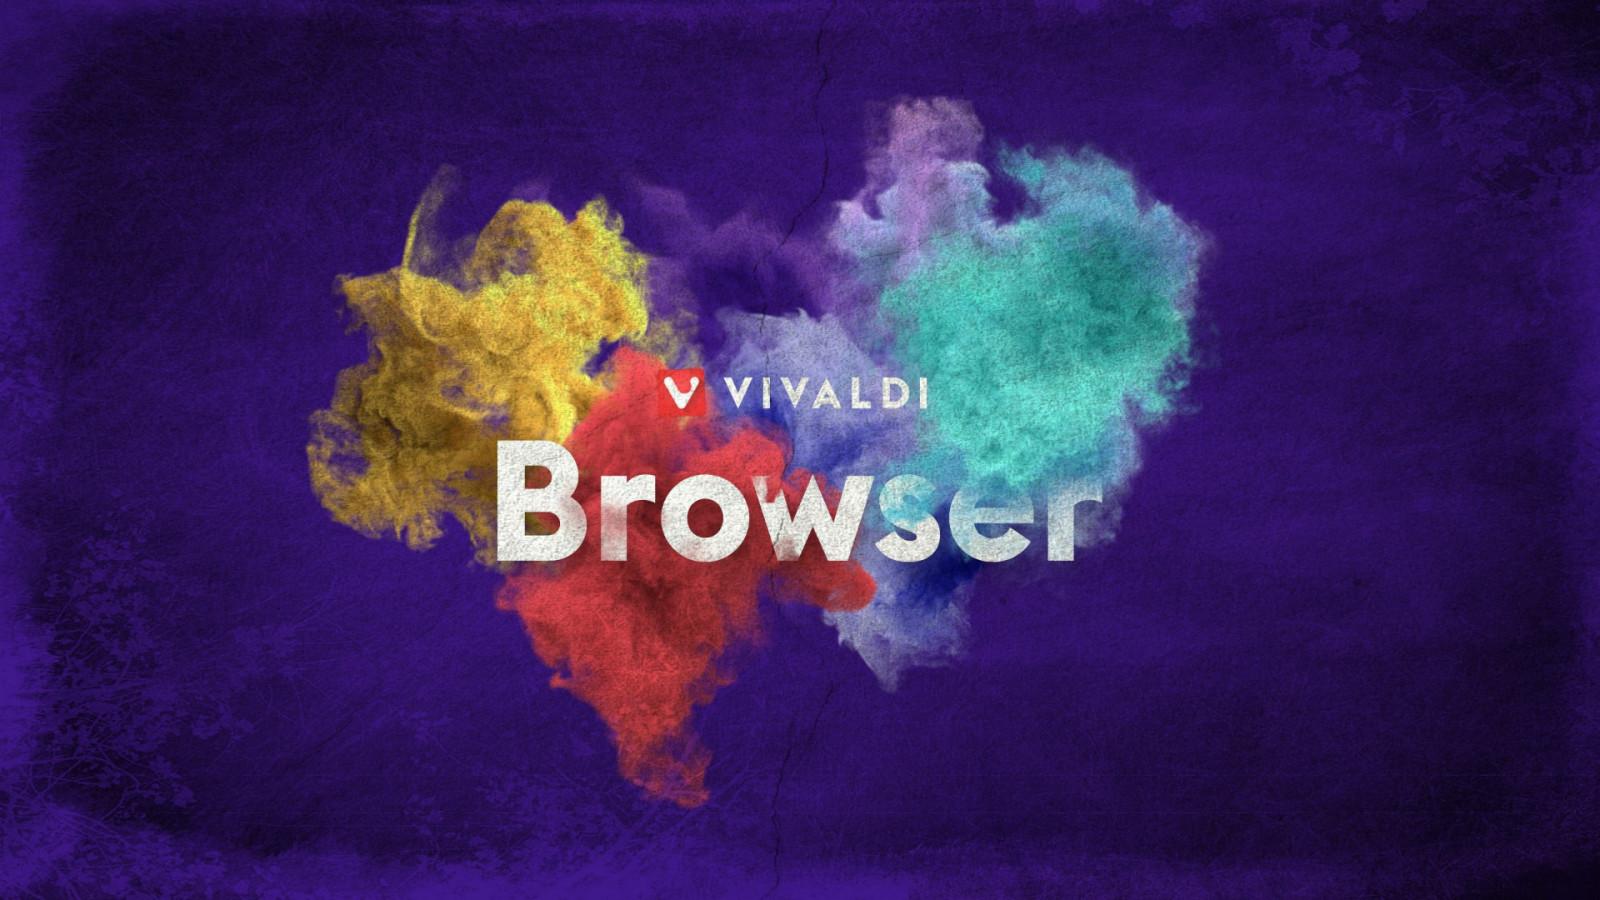 Image result for vivaldi browser hd pic